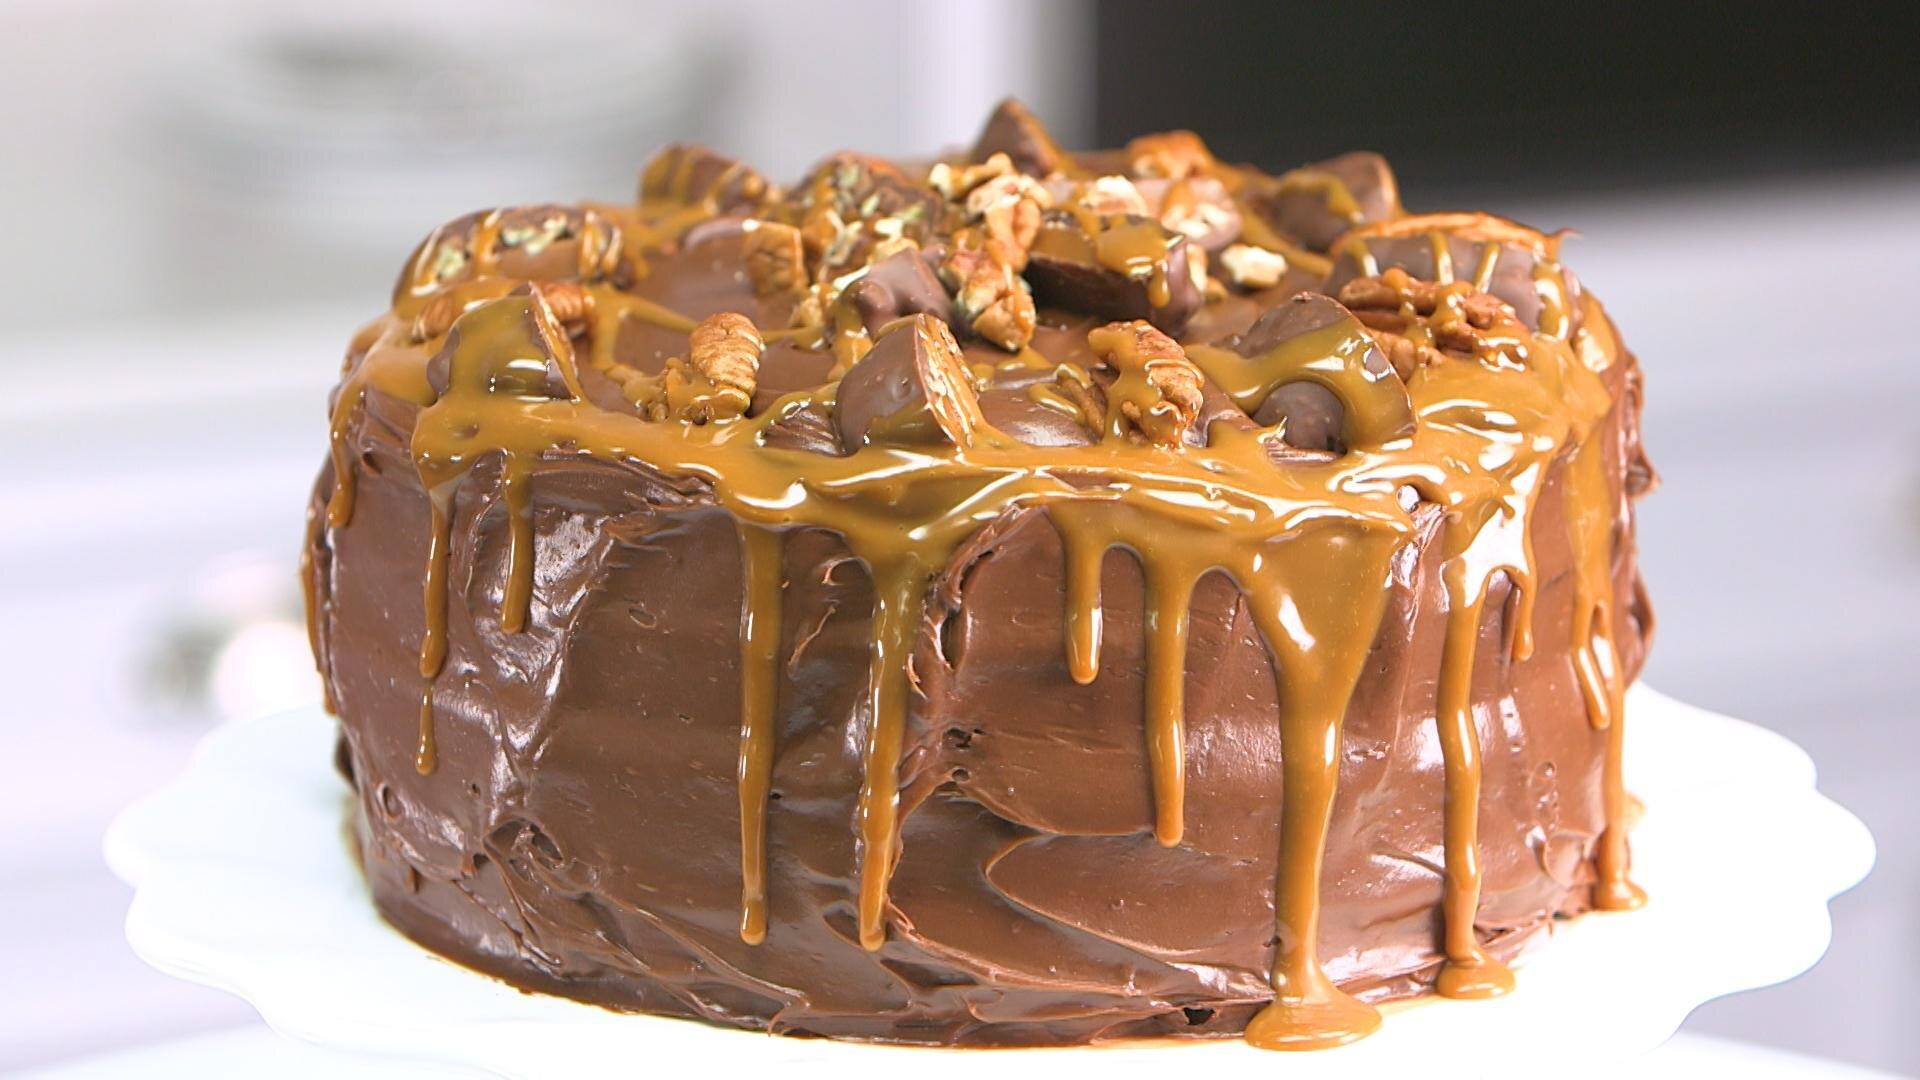 How to Make Chocolate Turtle Cake